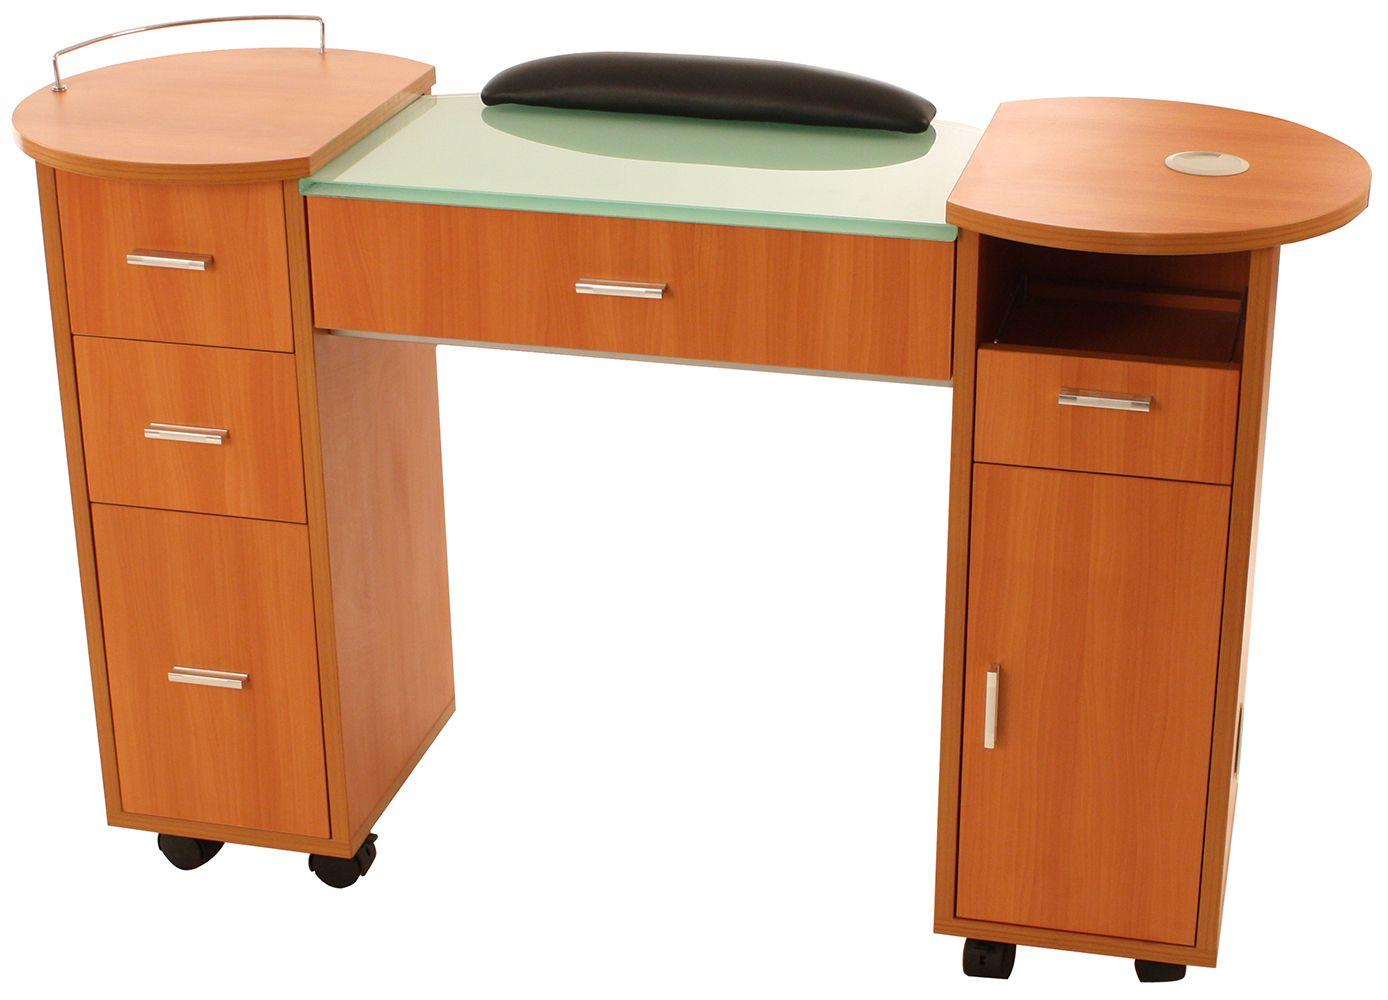 CC-9719 - Manicure Table | Nail salon equipment, Salon equipment and ...